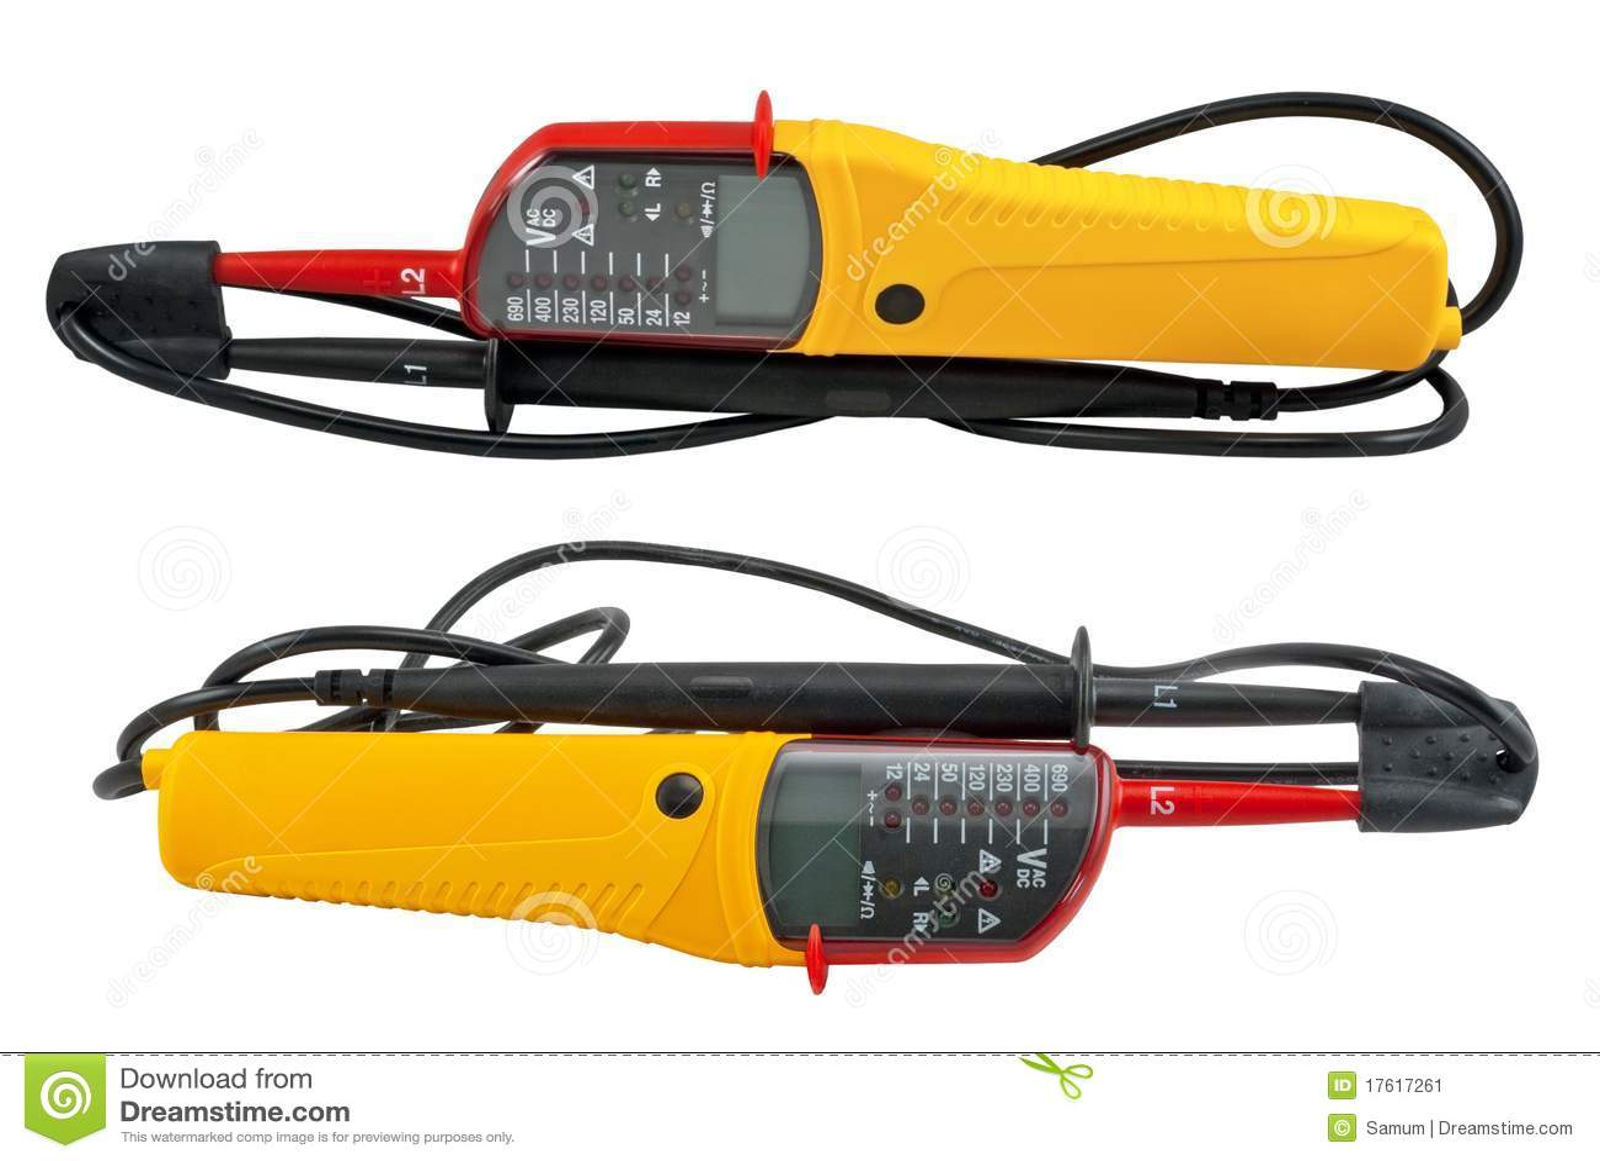 White Voltage Tester : Voltage tester stock image